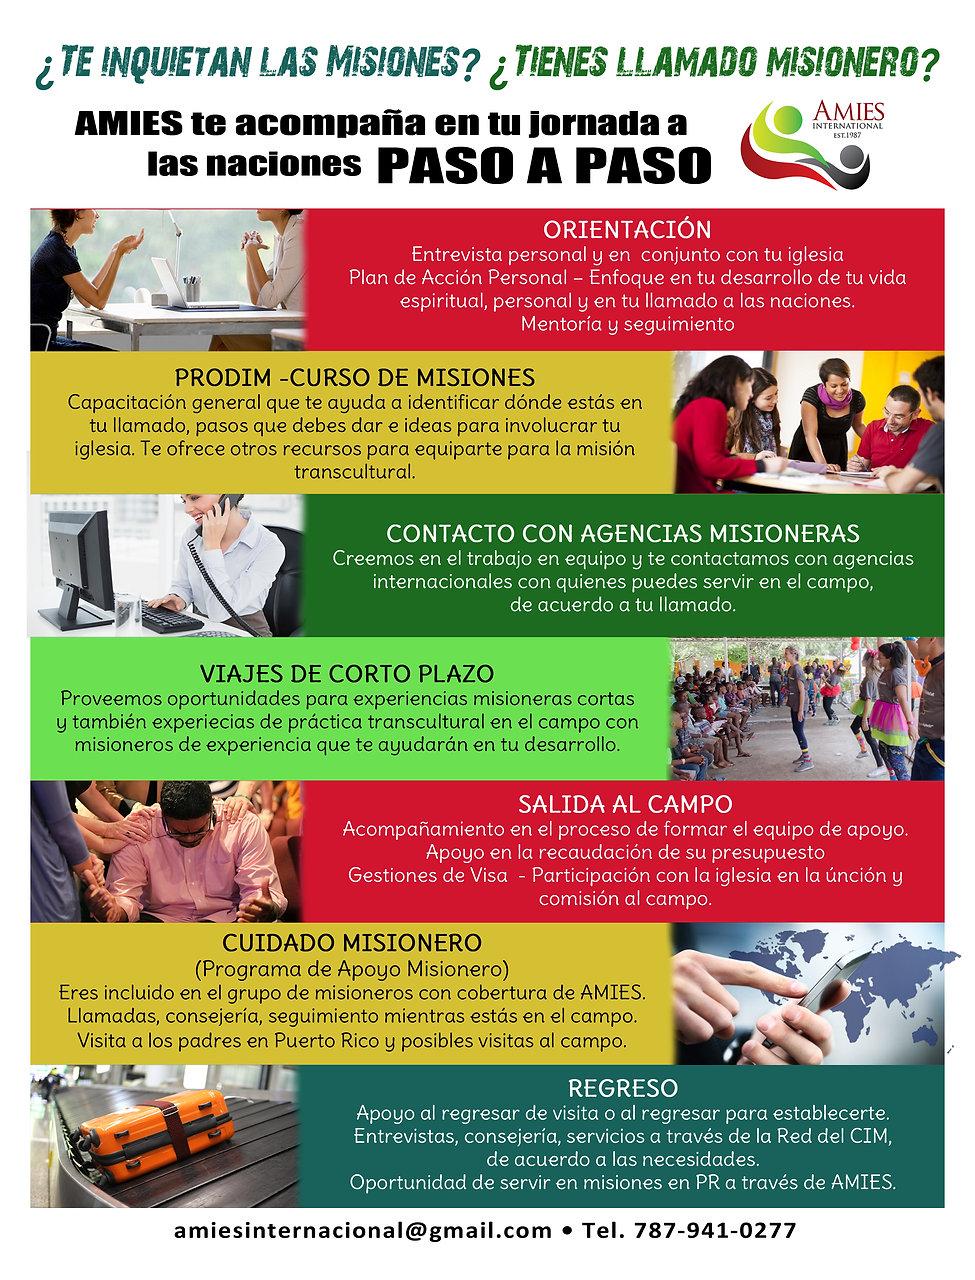 Paso a Paso-2 (2).jpg